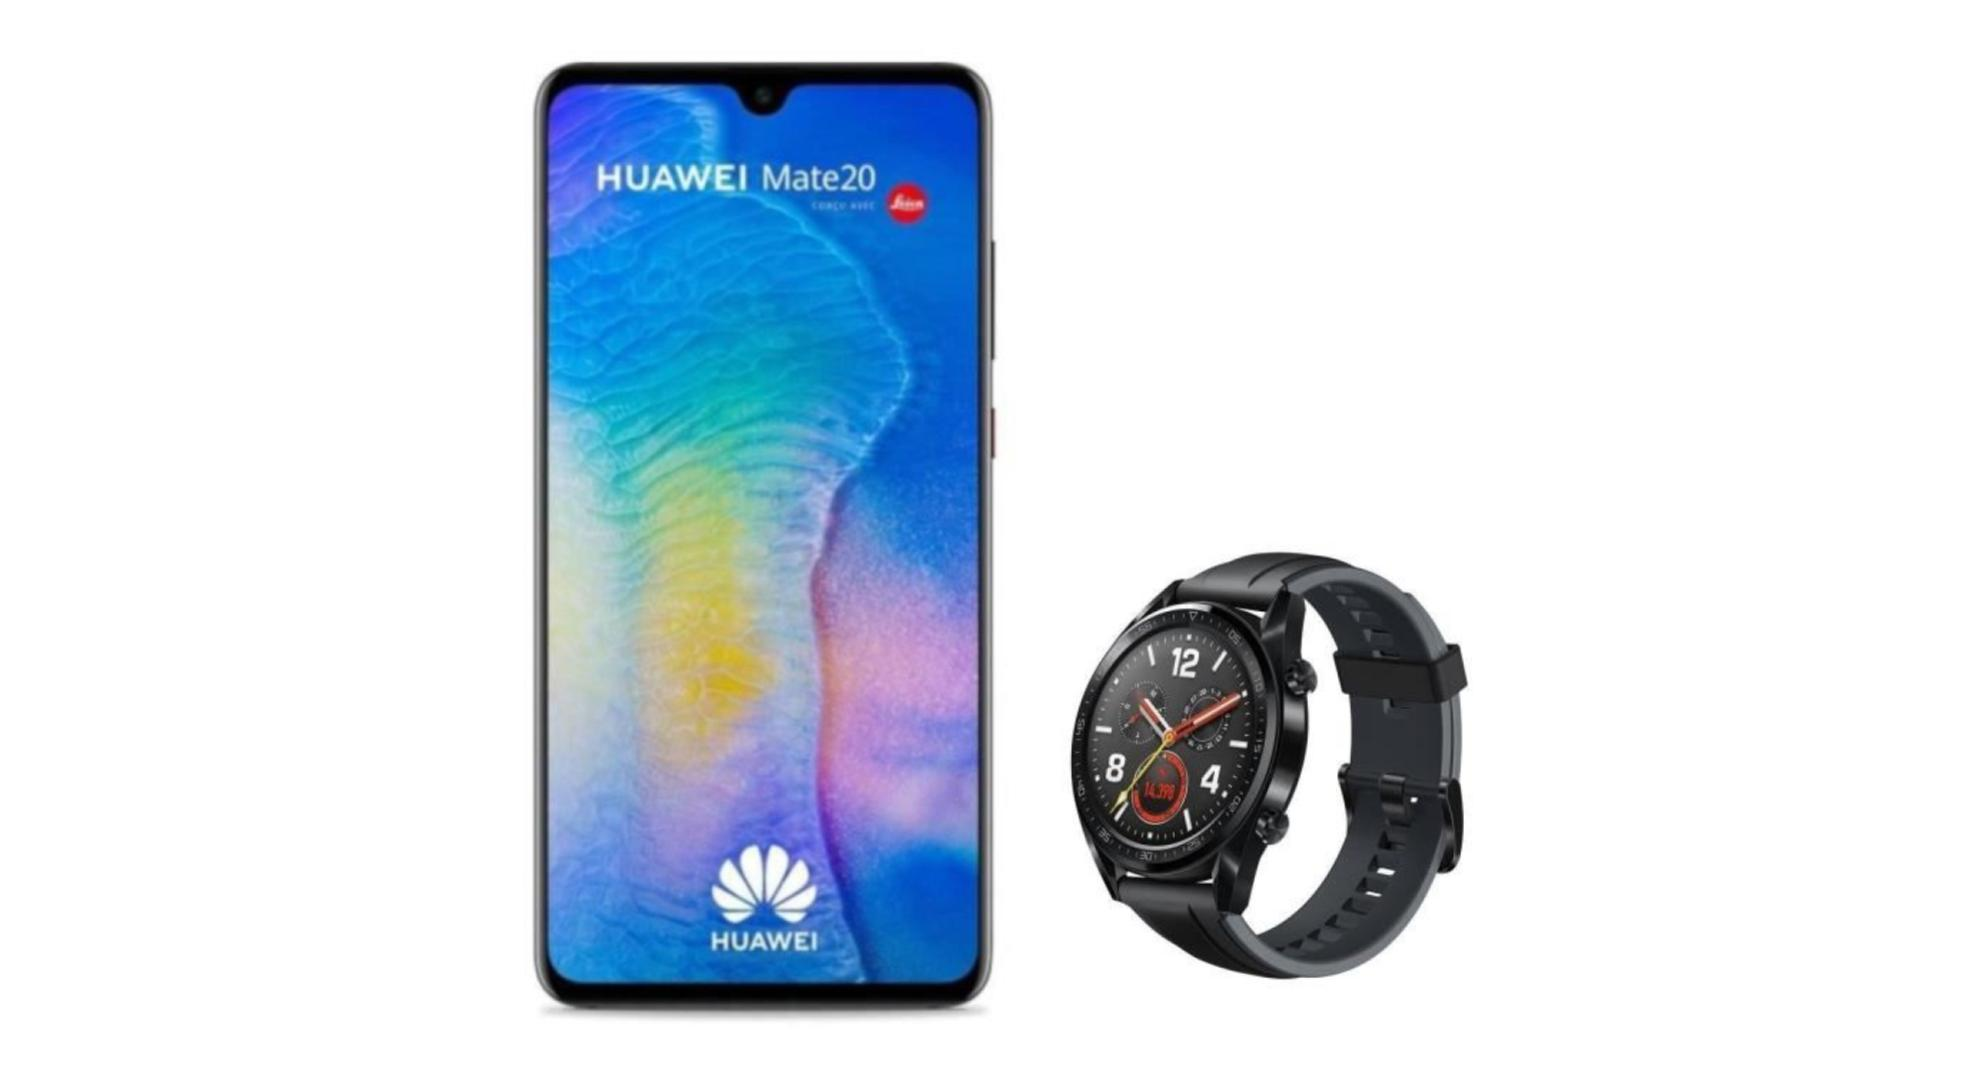 Carte Cadeau Huawei.Le Mate 20 Passe A 369 Euros Avec Une Montre Huawei Watch Gt